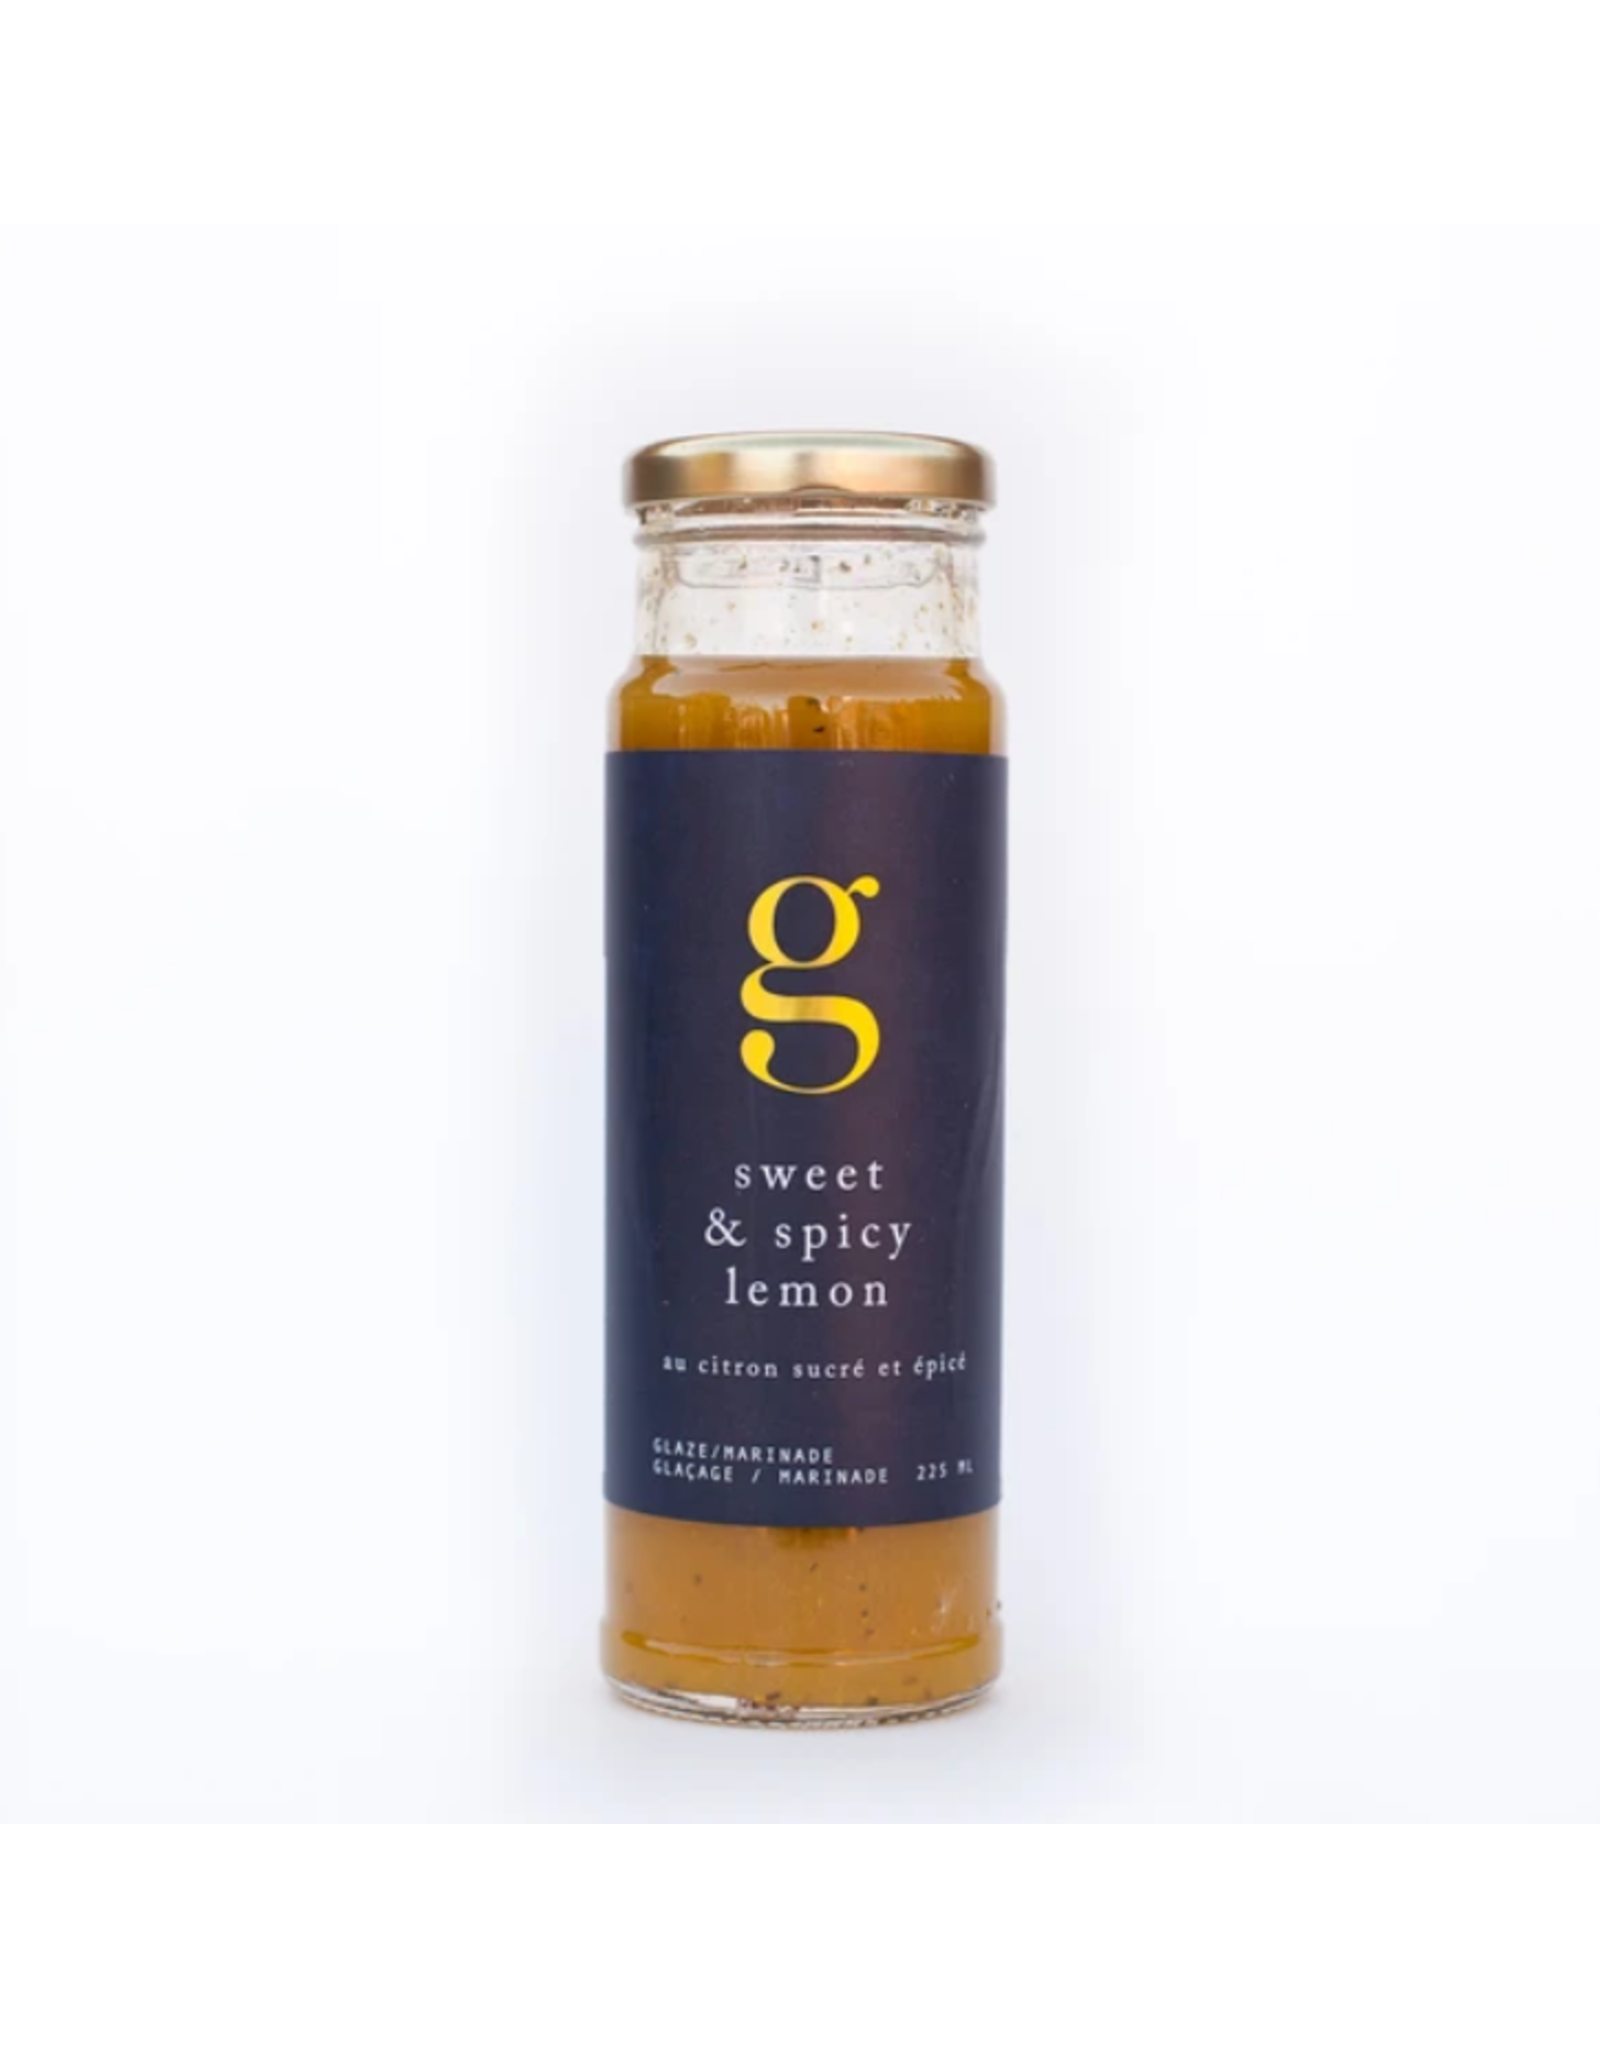 Gourmet Inspirations Gourmet Inspirations, Sweet & Spicy Lemon Glaze/Marinade 225ml